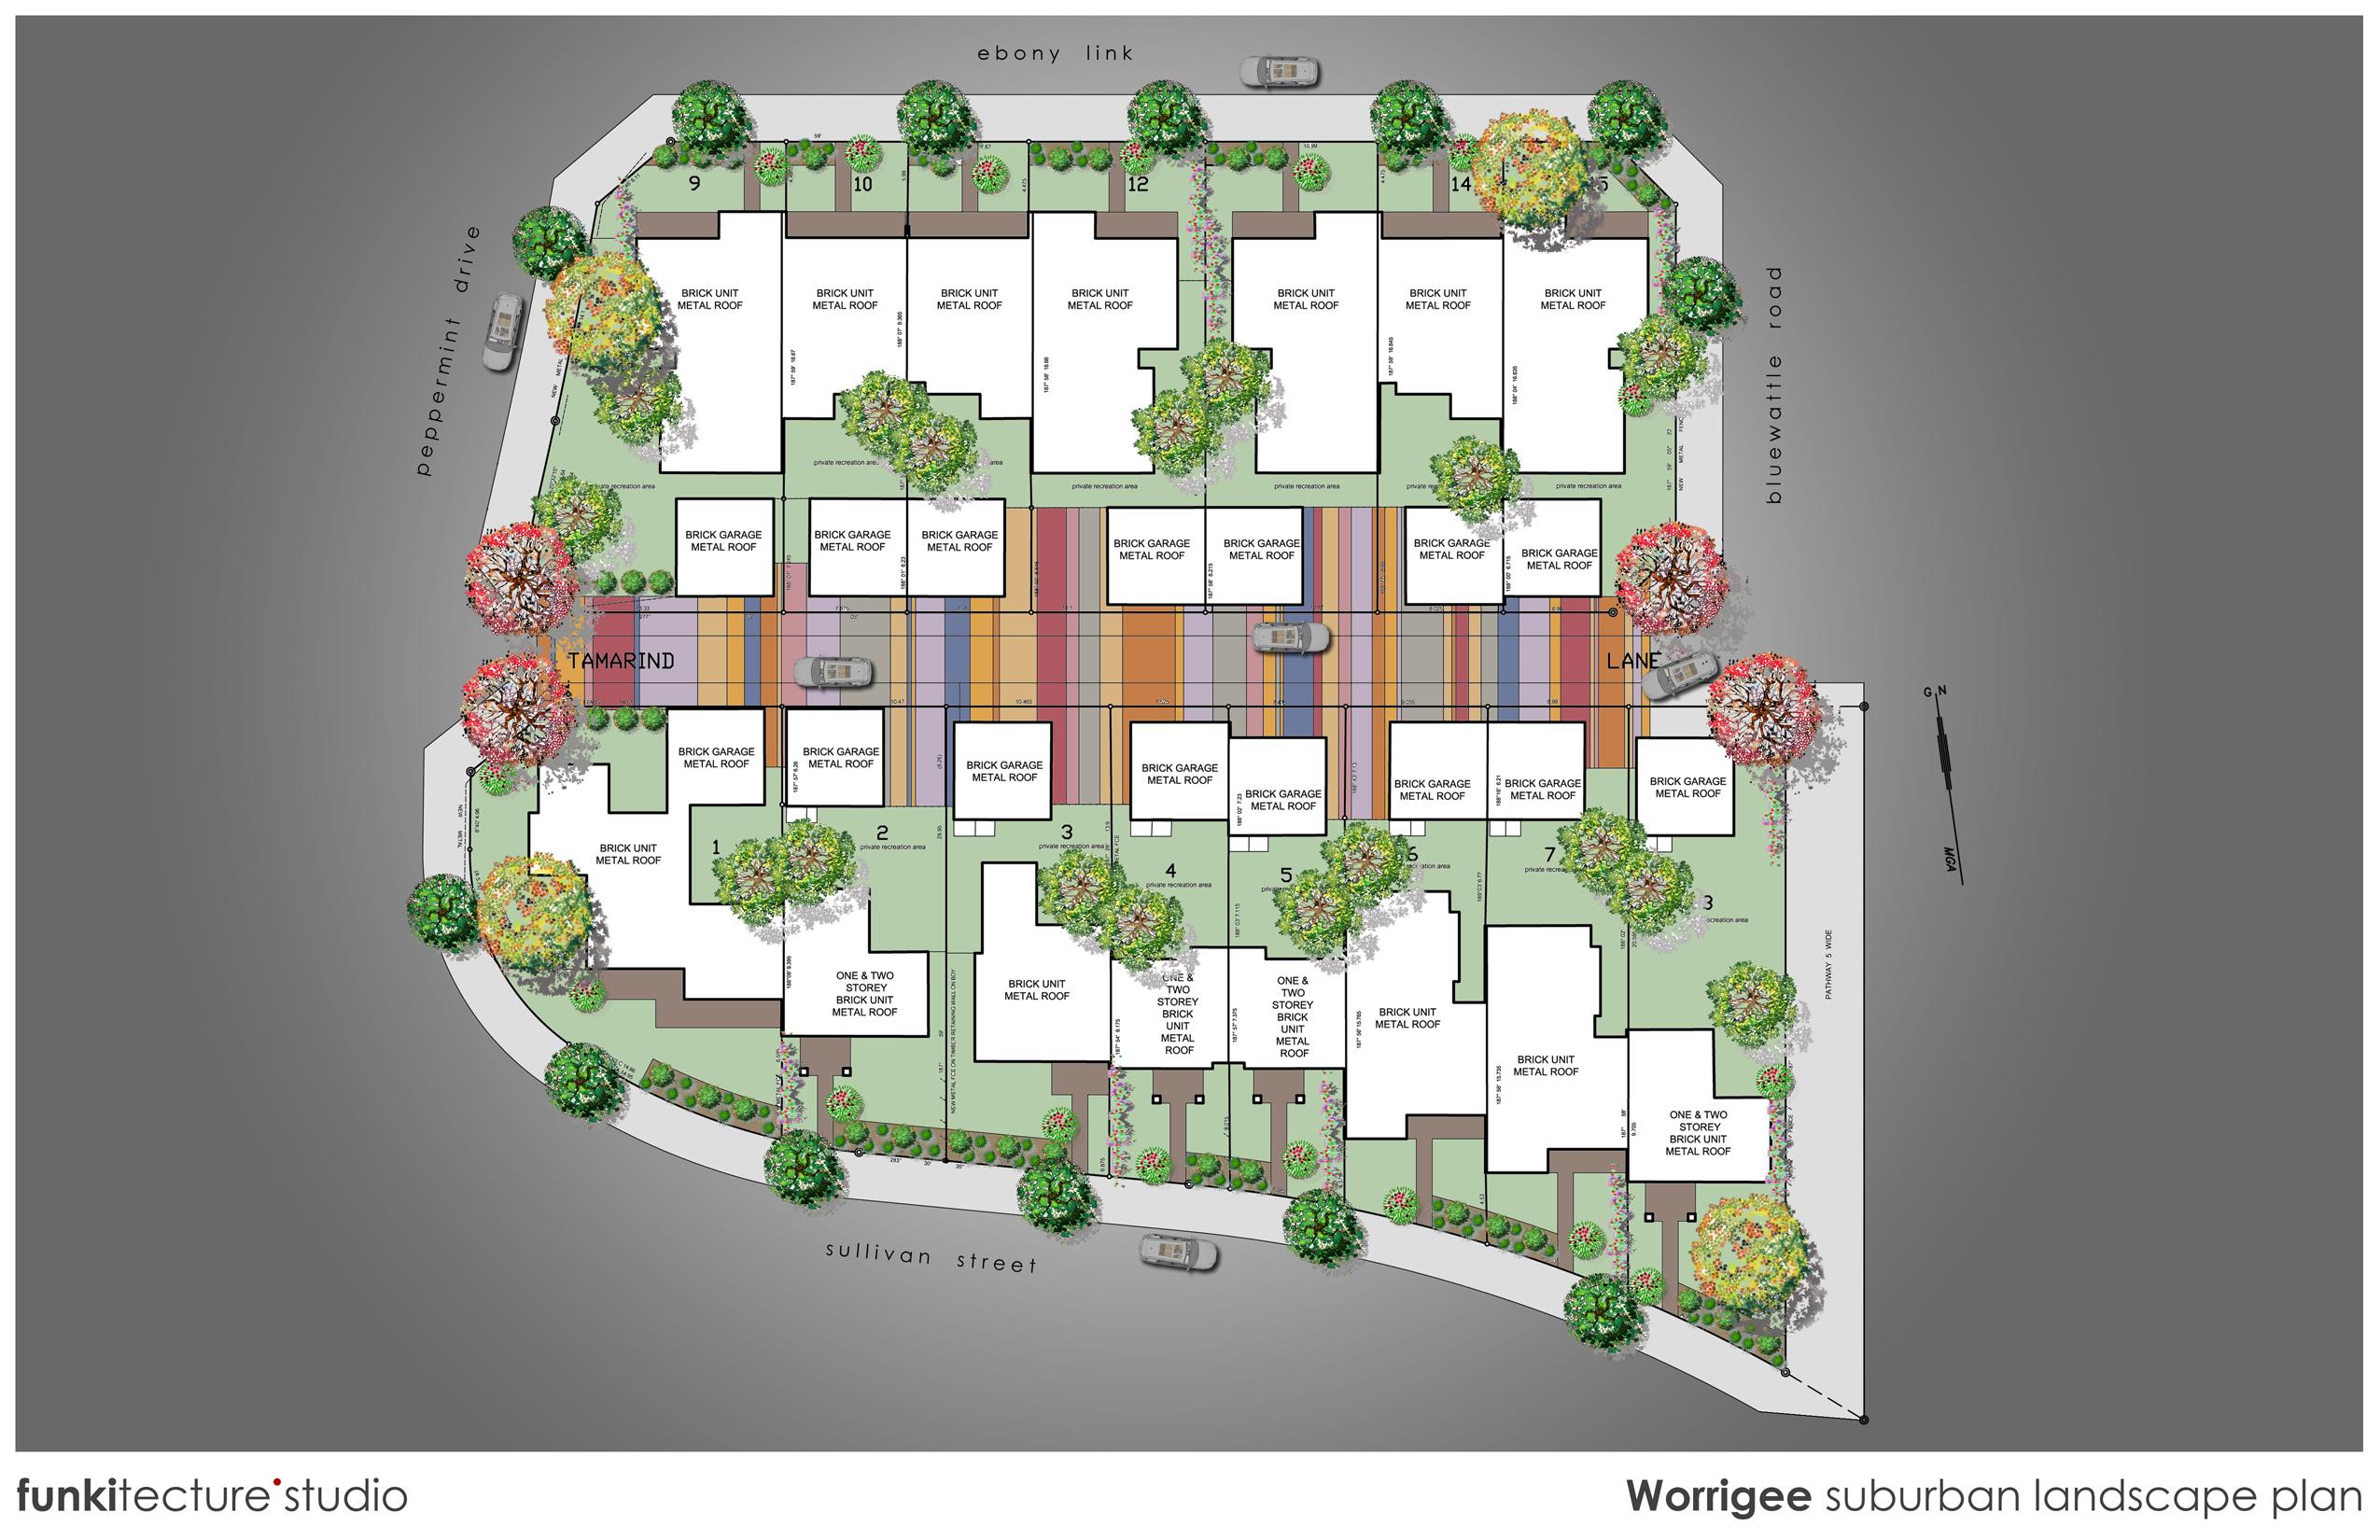 Worrigee suburban landscape plan